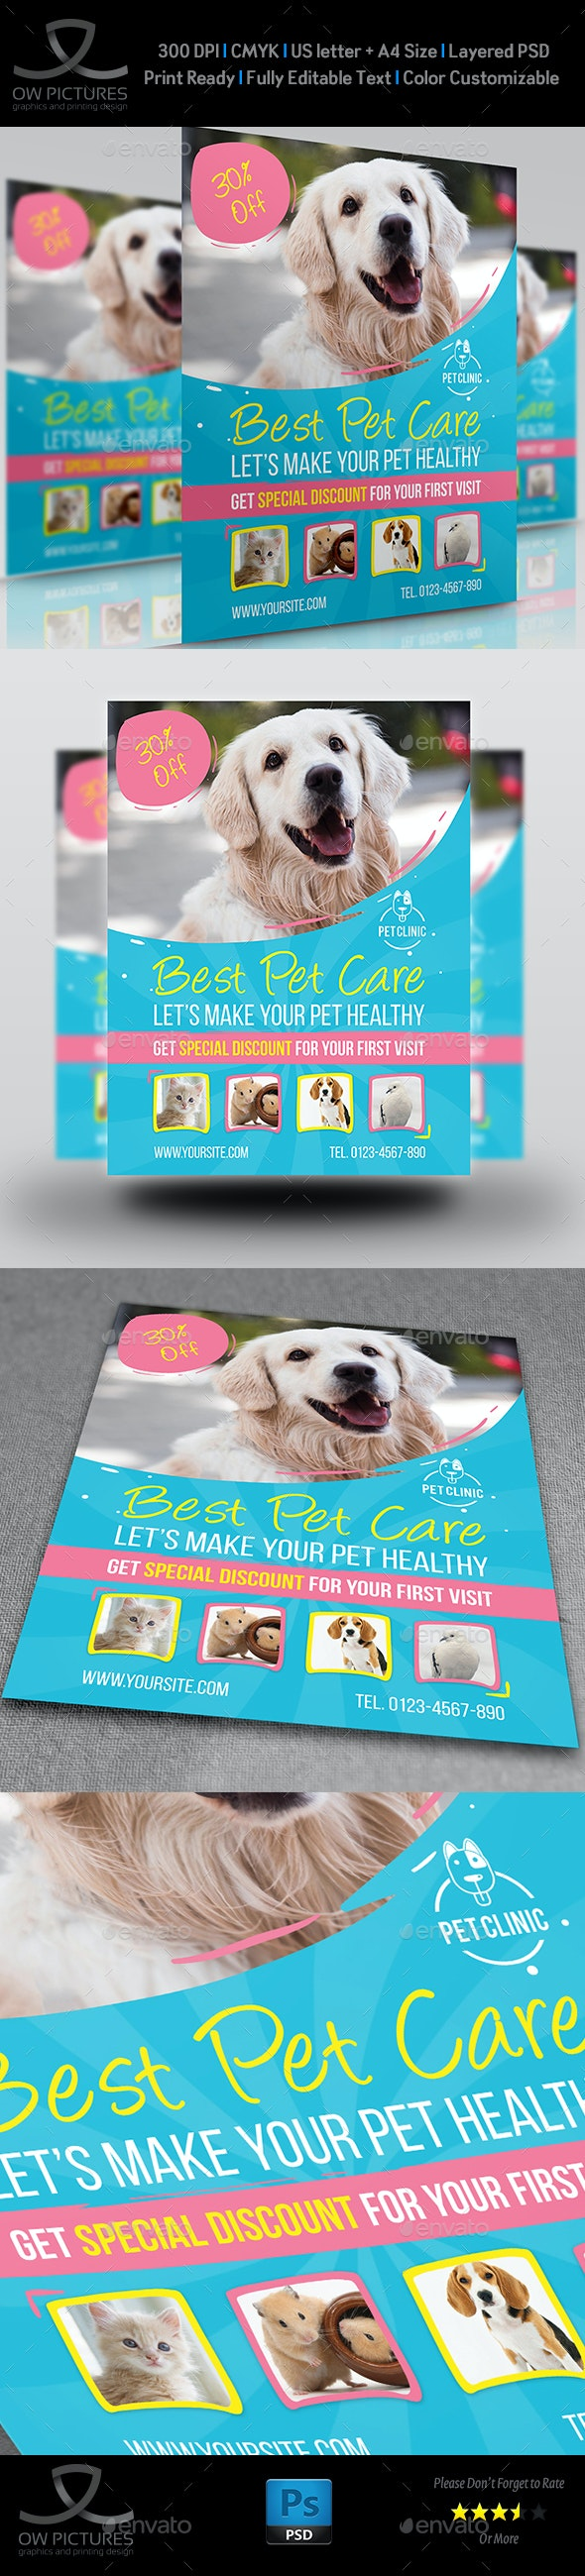 Pet Care Center Flyer Template - Flyers Print Templates